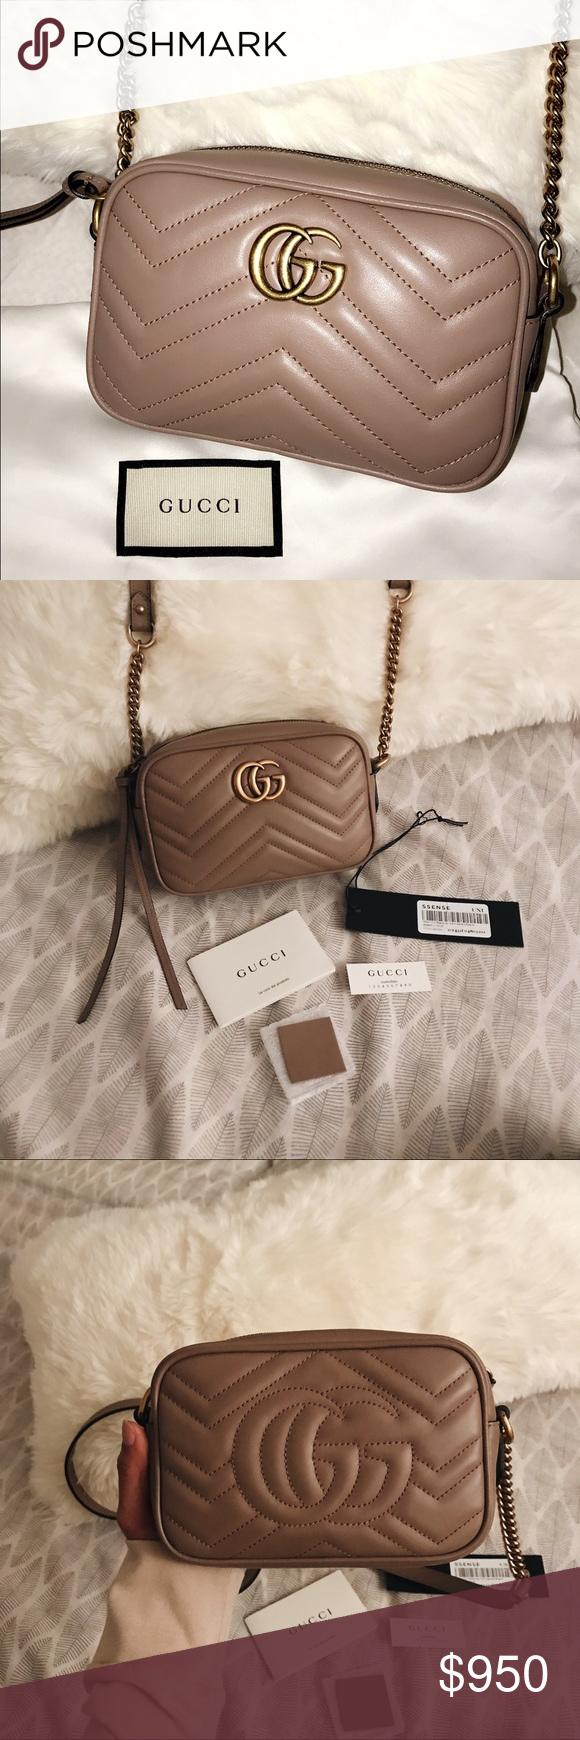 cf9cb6755d0b6b AUTHENTIC Gucci GG Marmont matelassé mini bag AUTHENTIC Gucci GG Marmont  matelassé mini bag in '